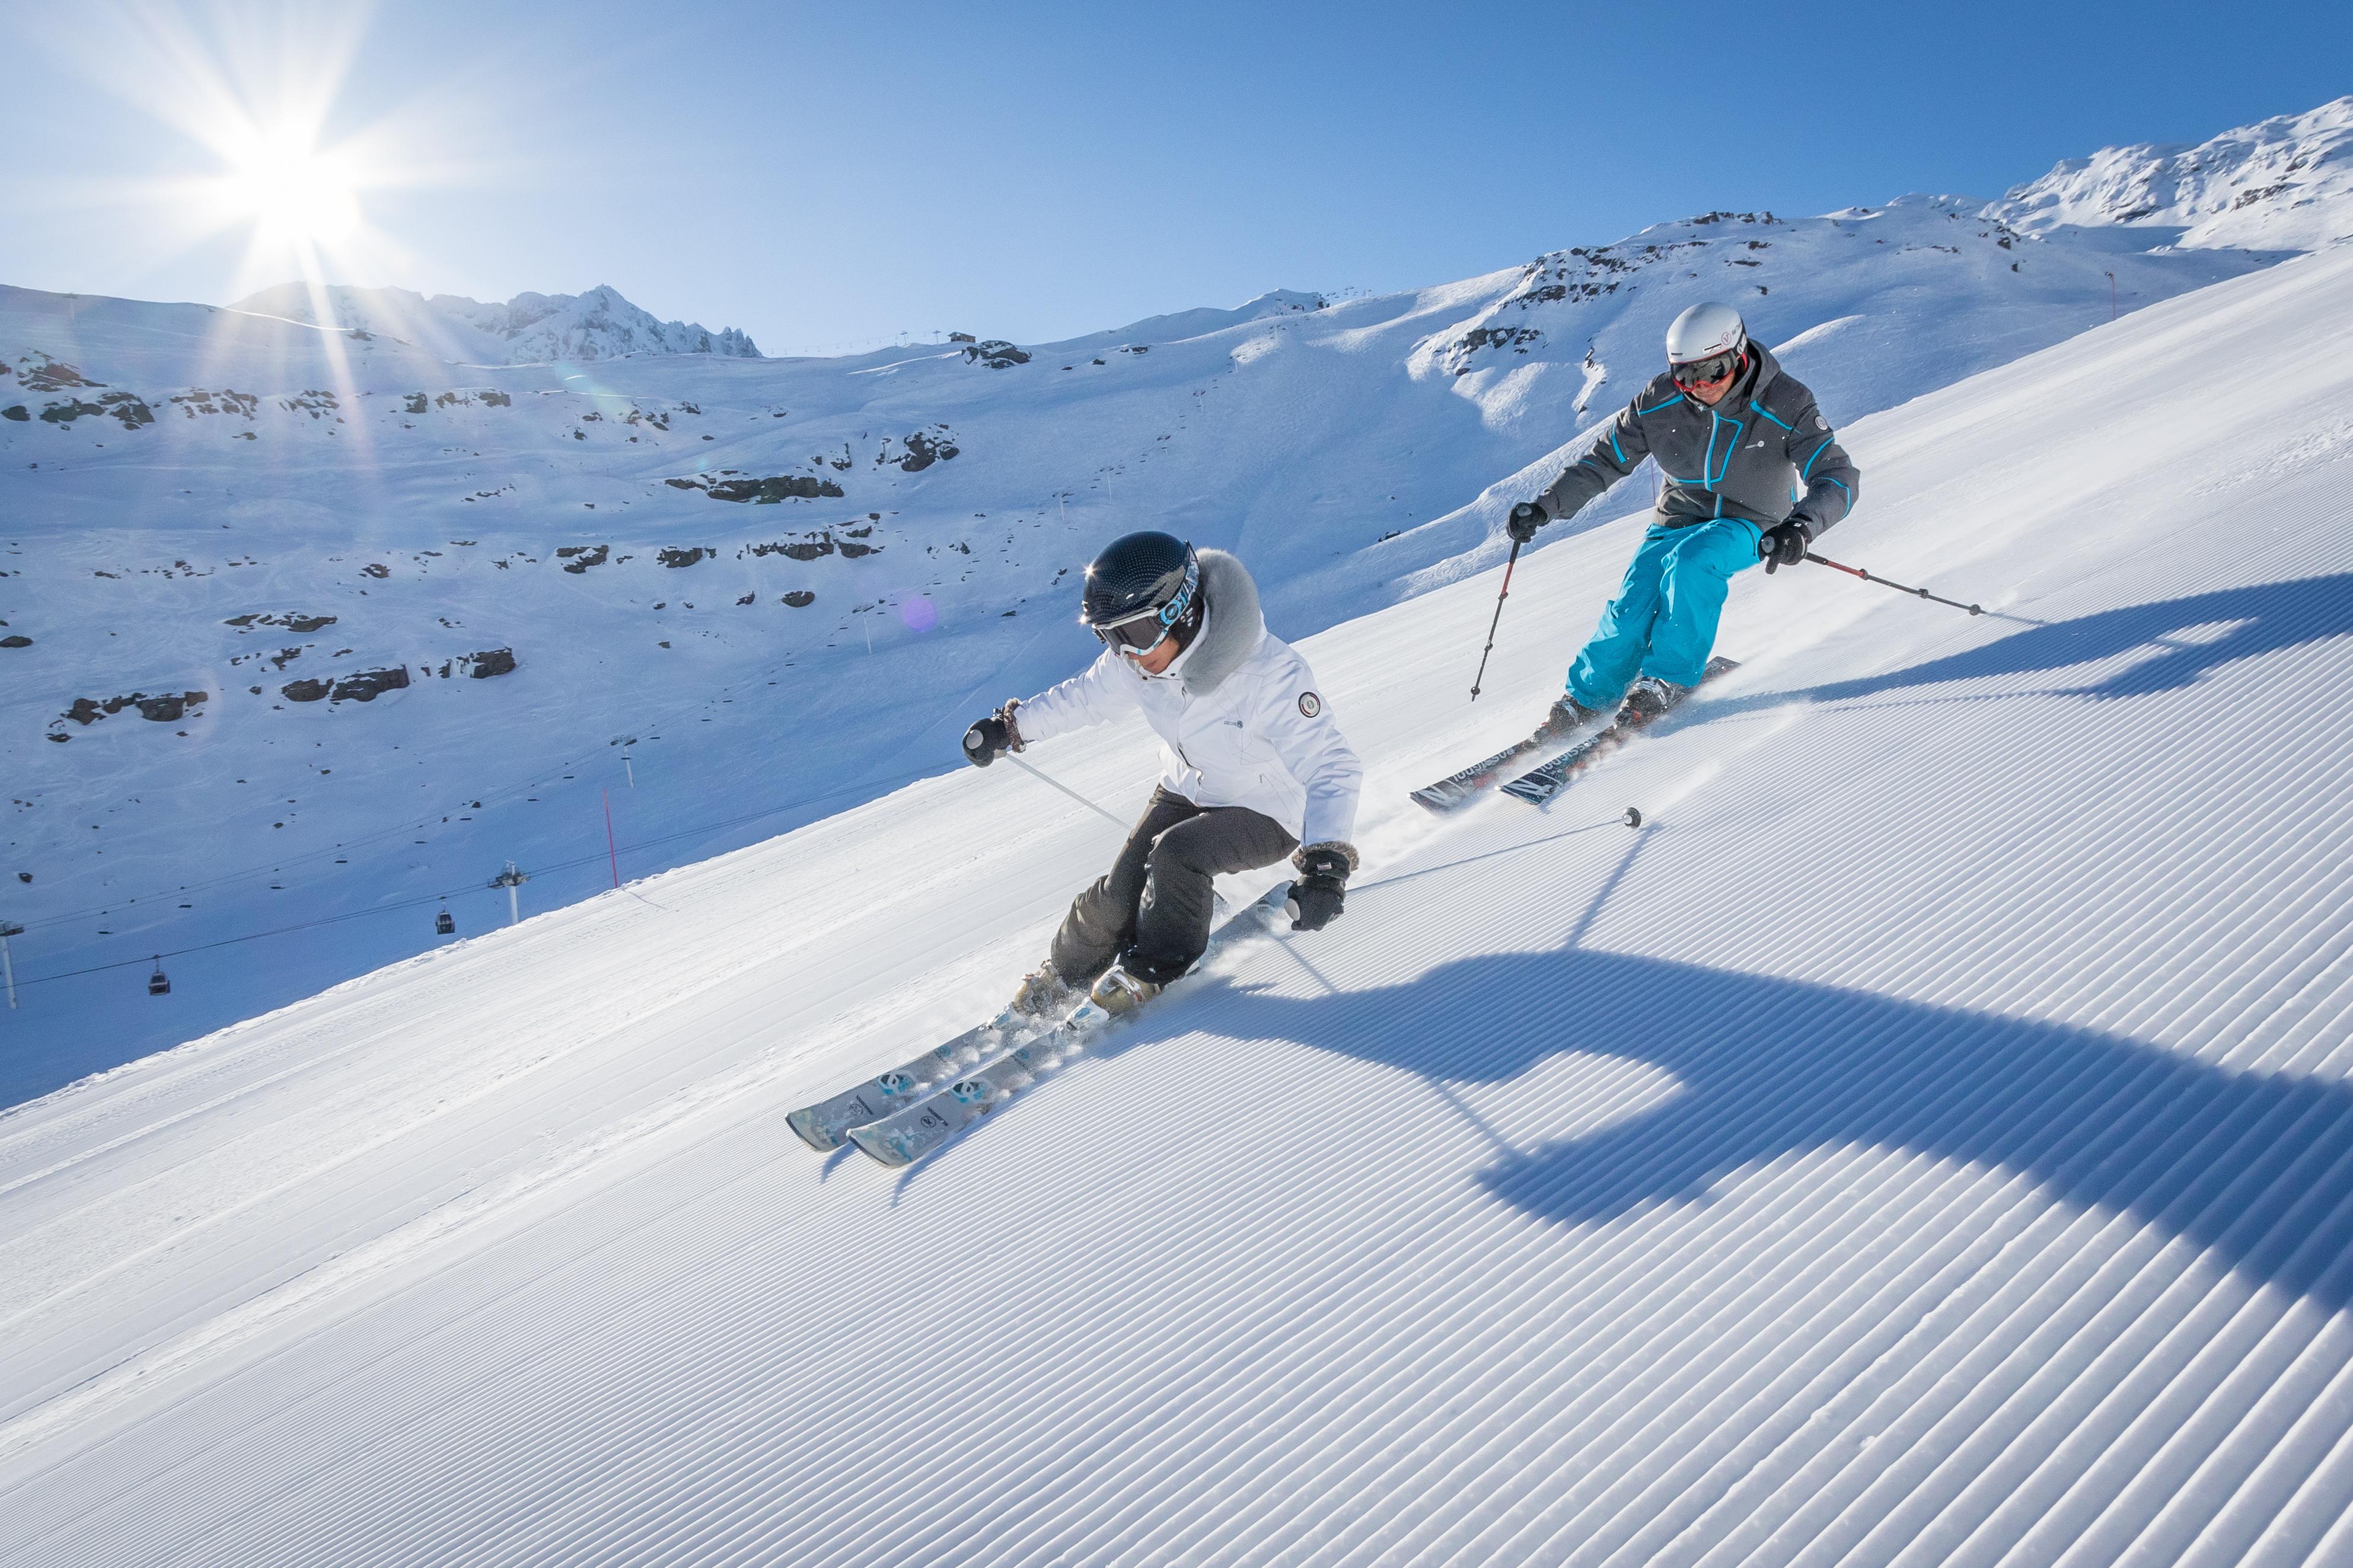 world ski awards 2018: best resorts, hotels, operators and more